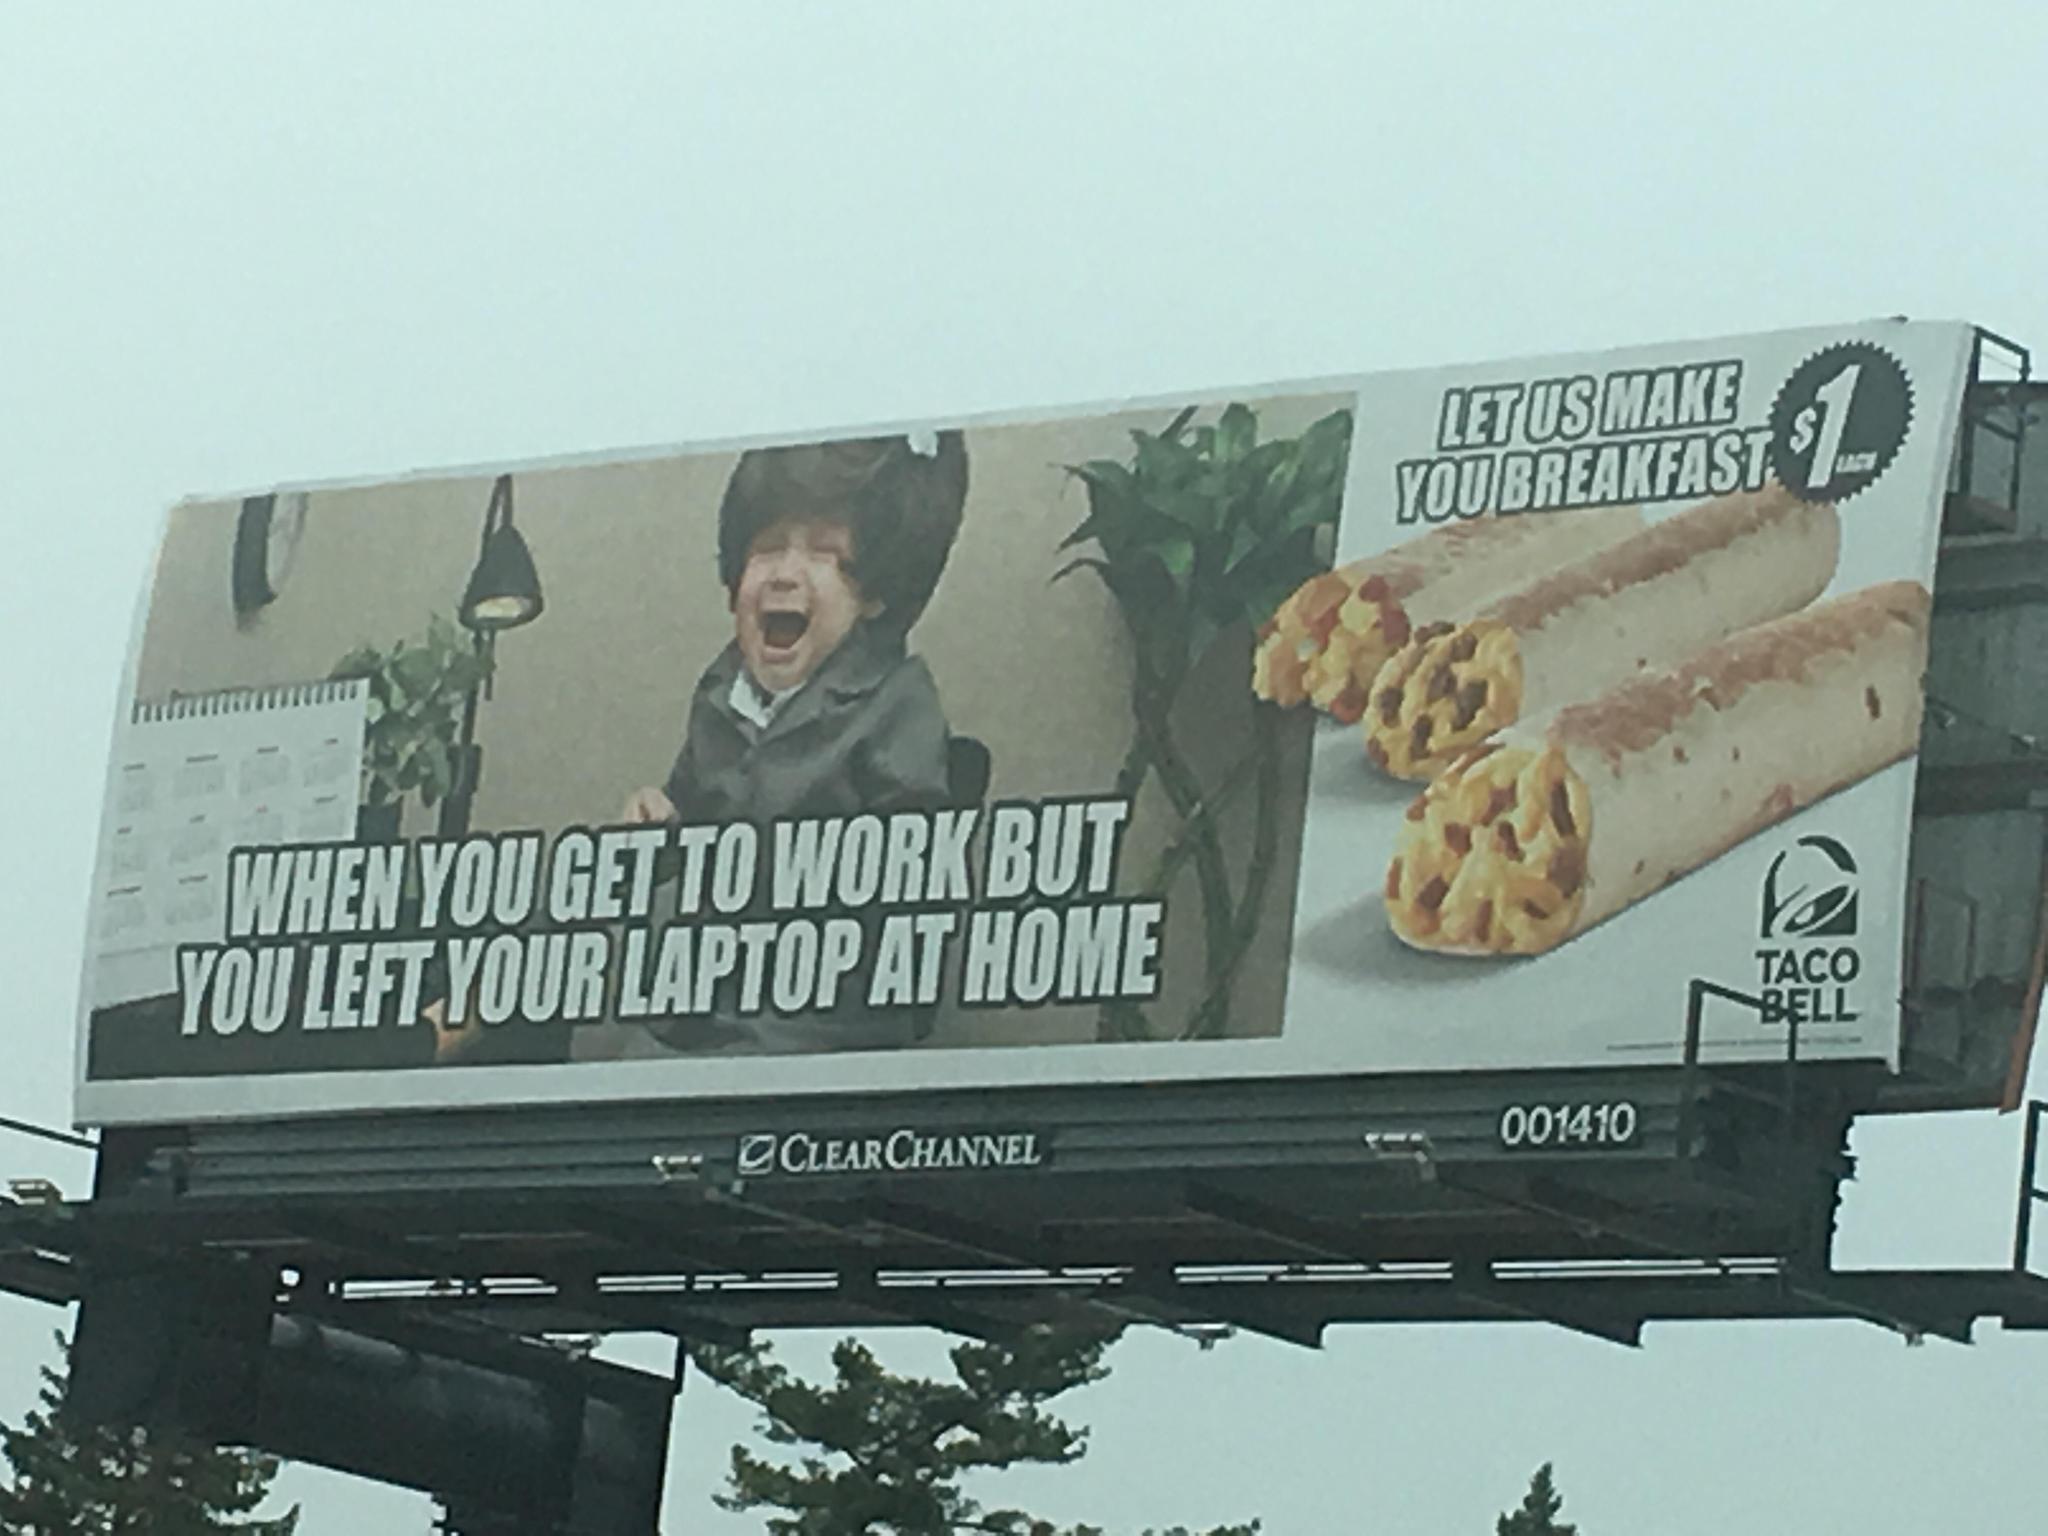 Taco Bell understands memes